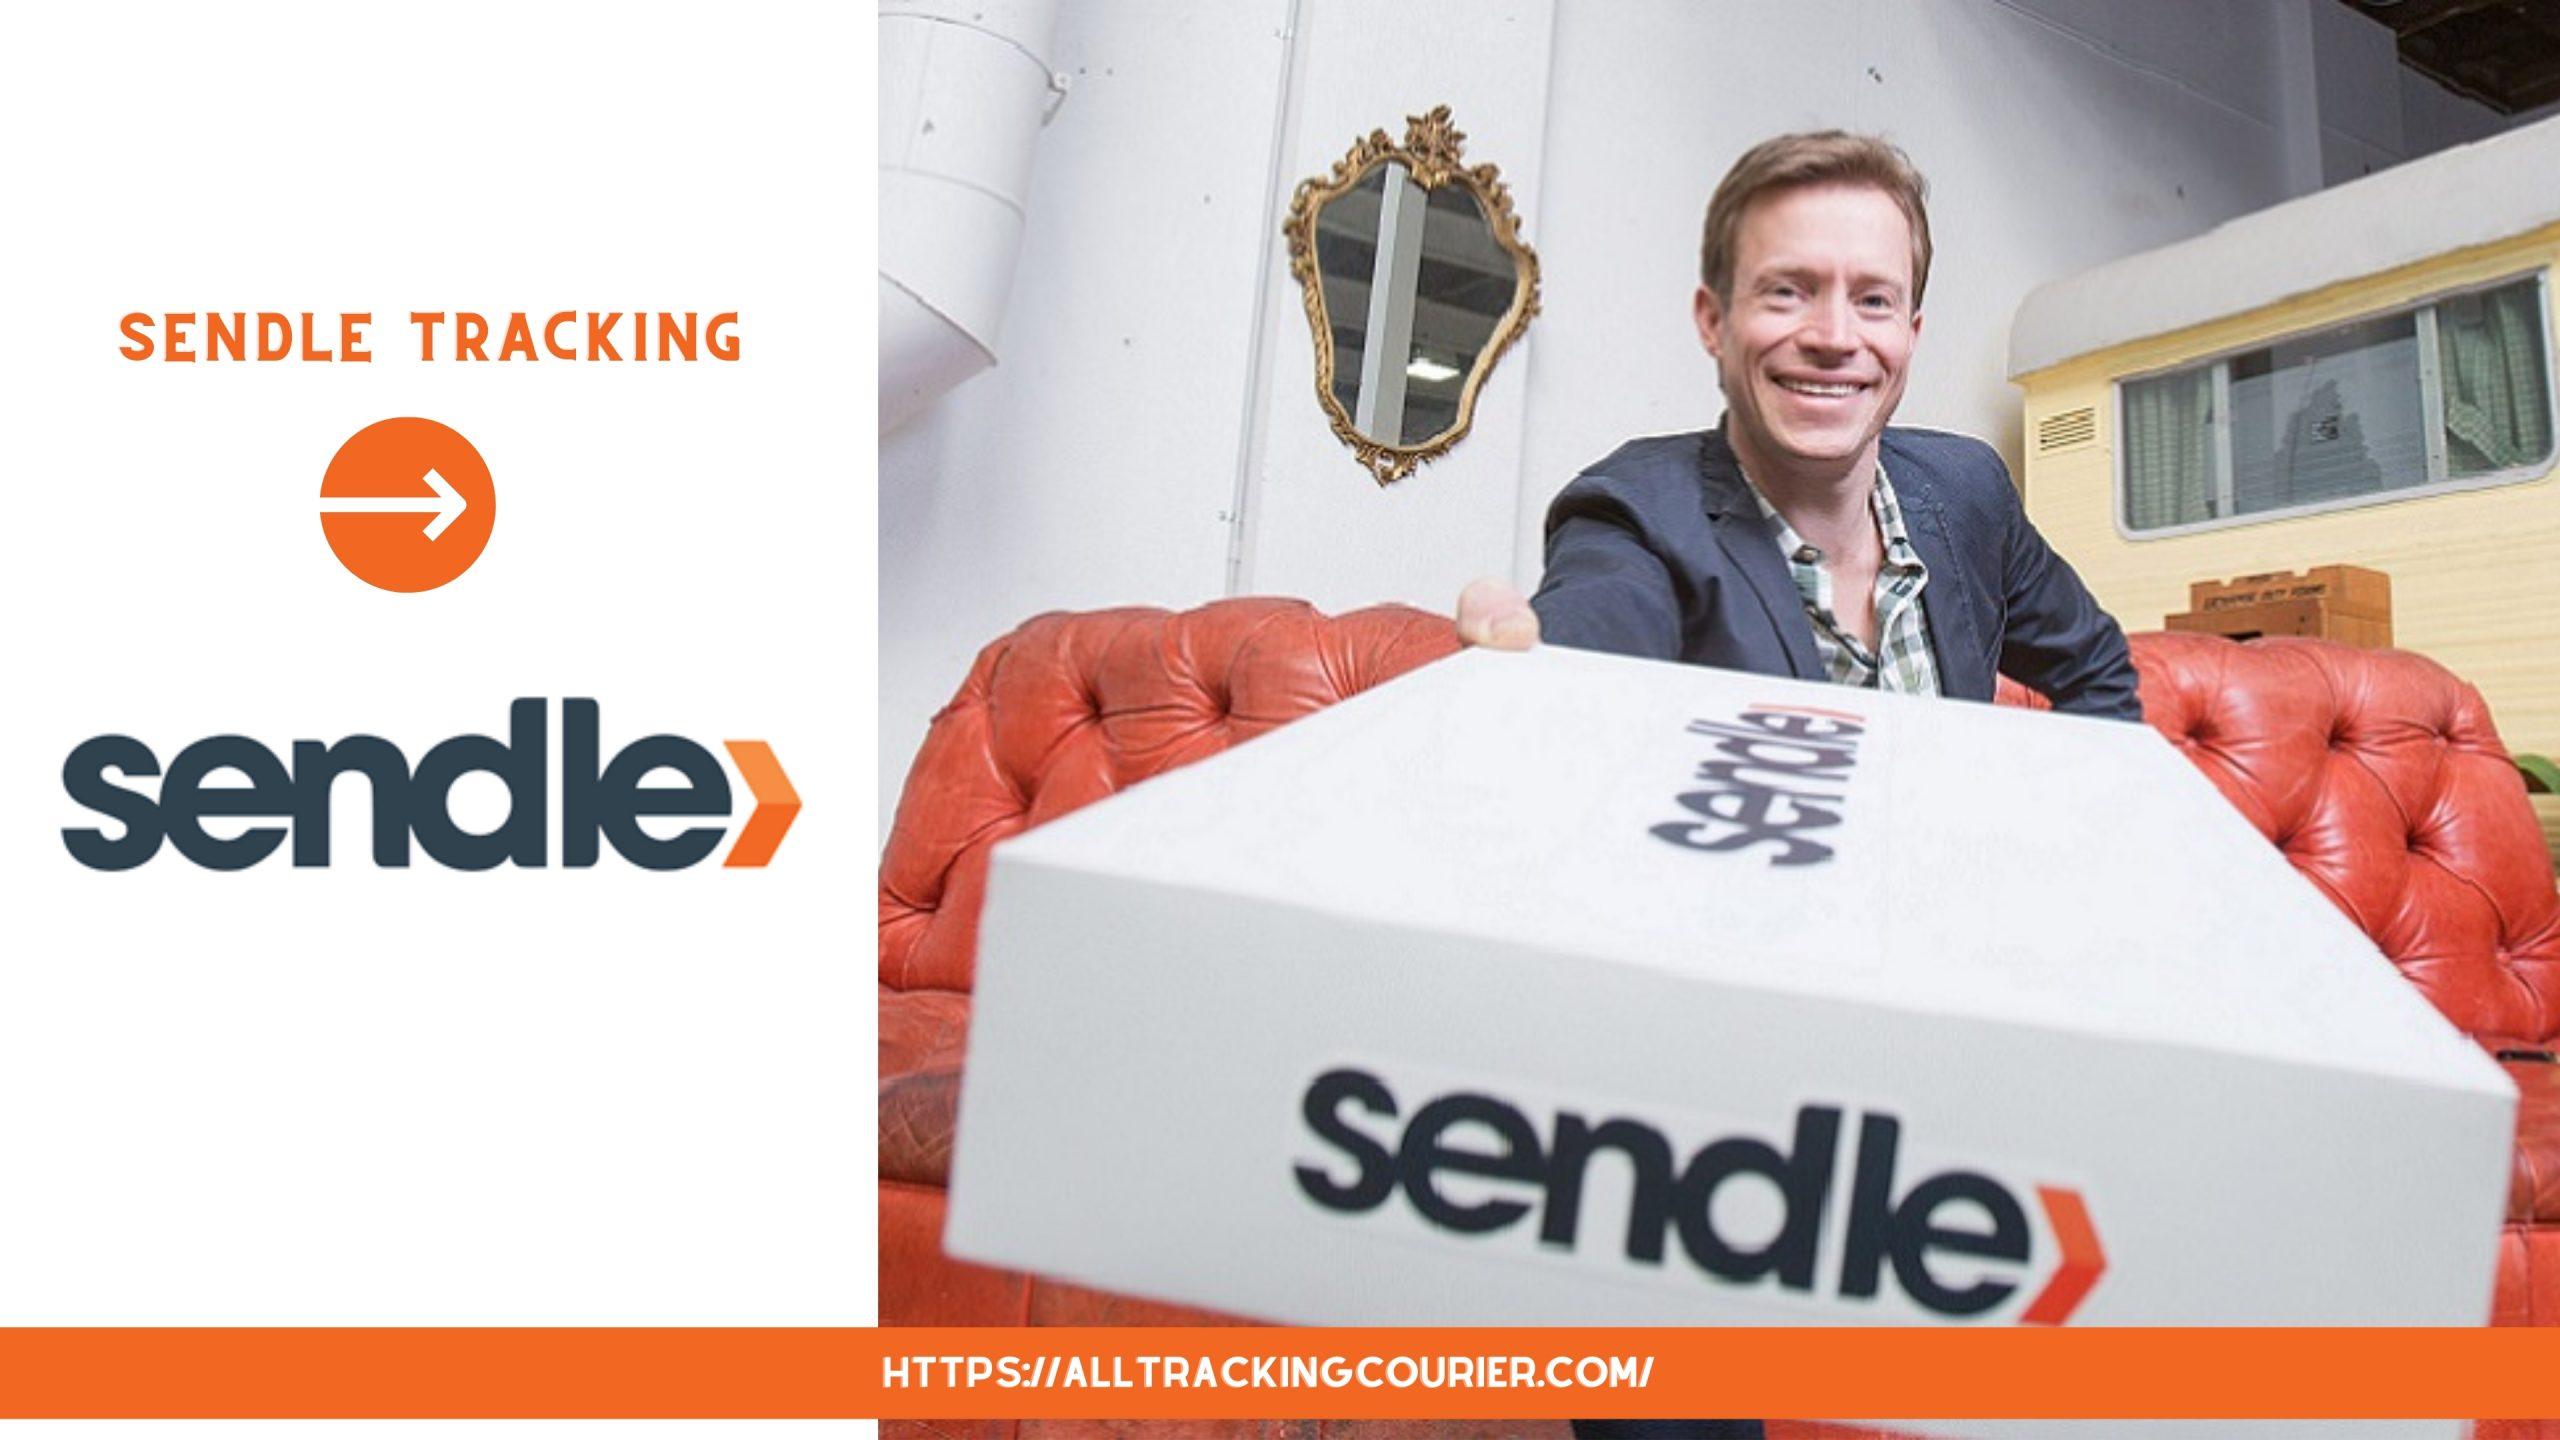 Sendle Tracking